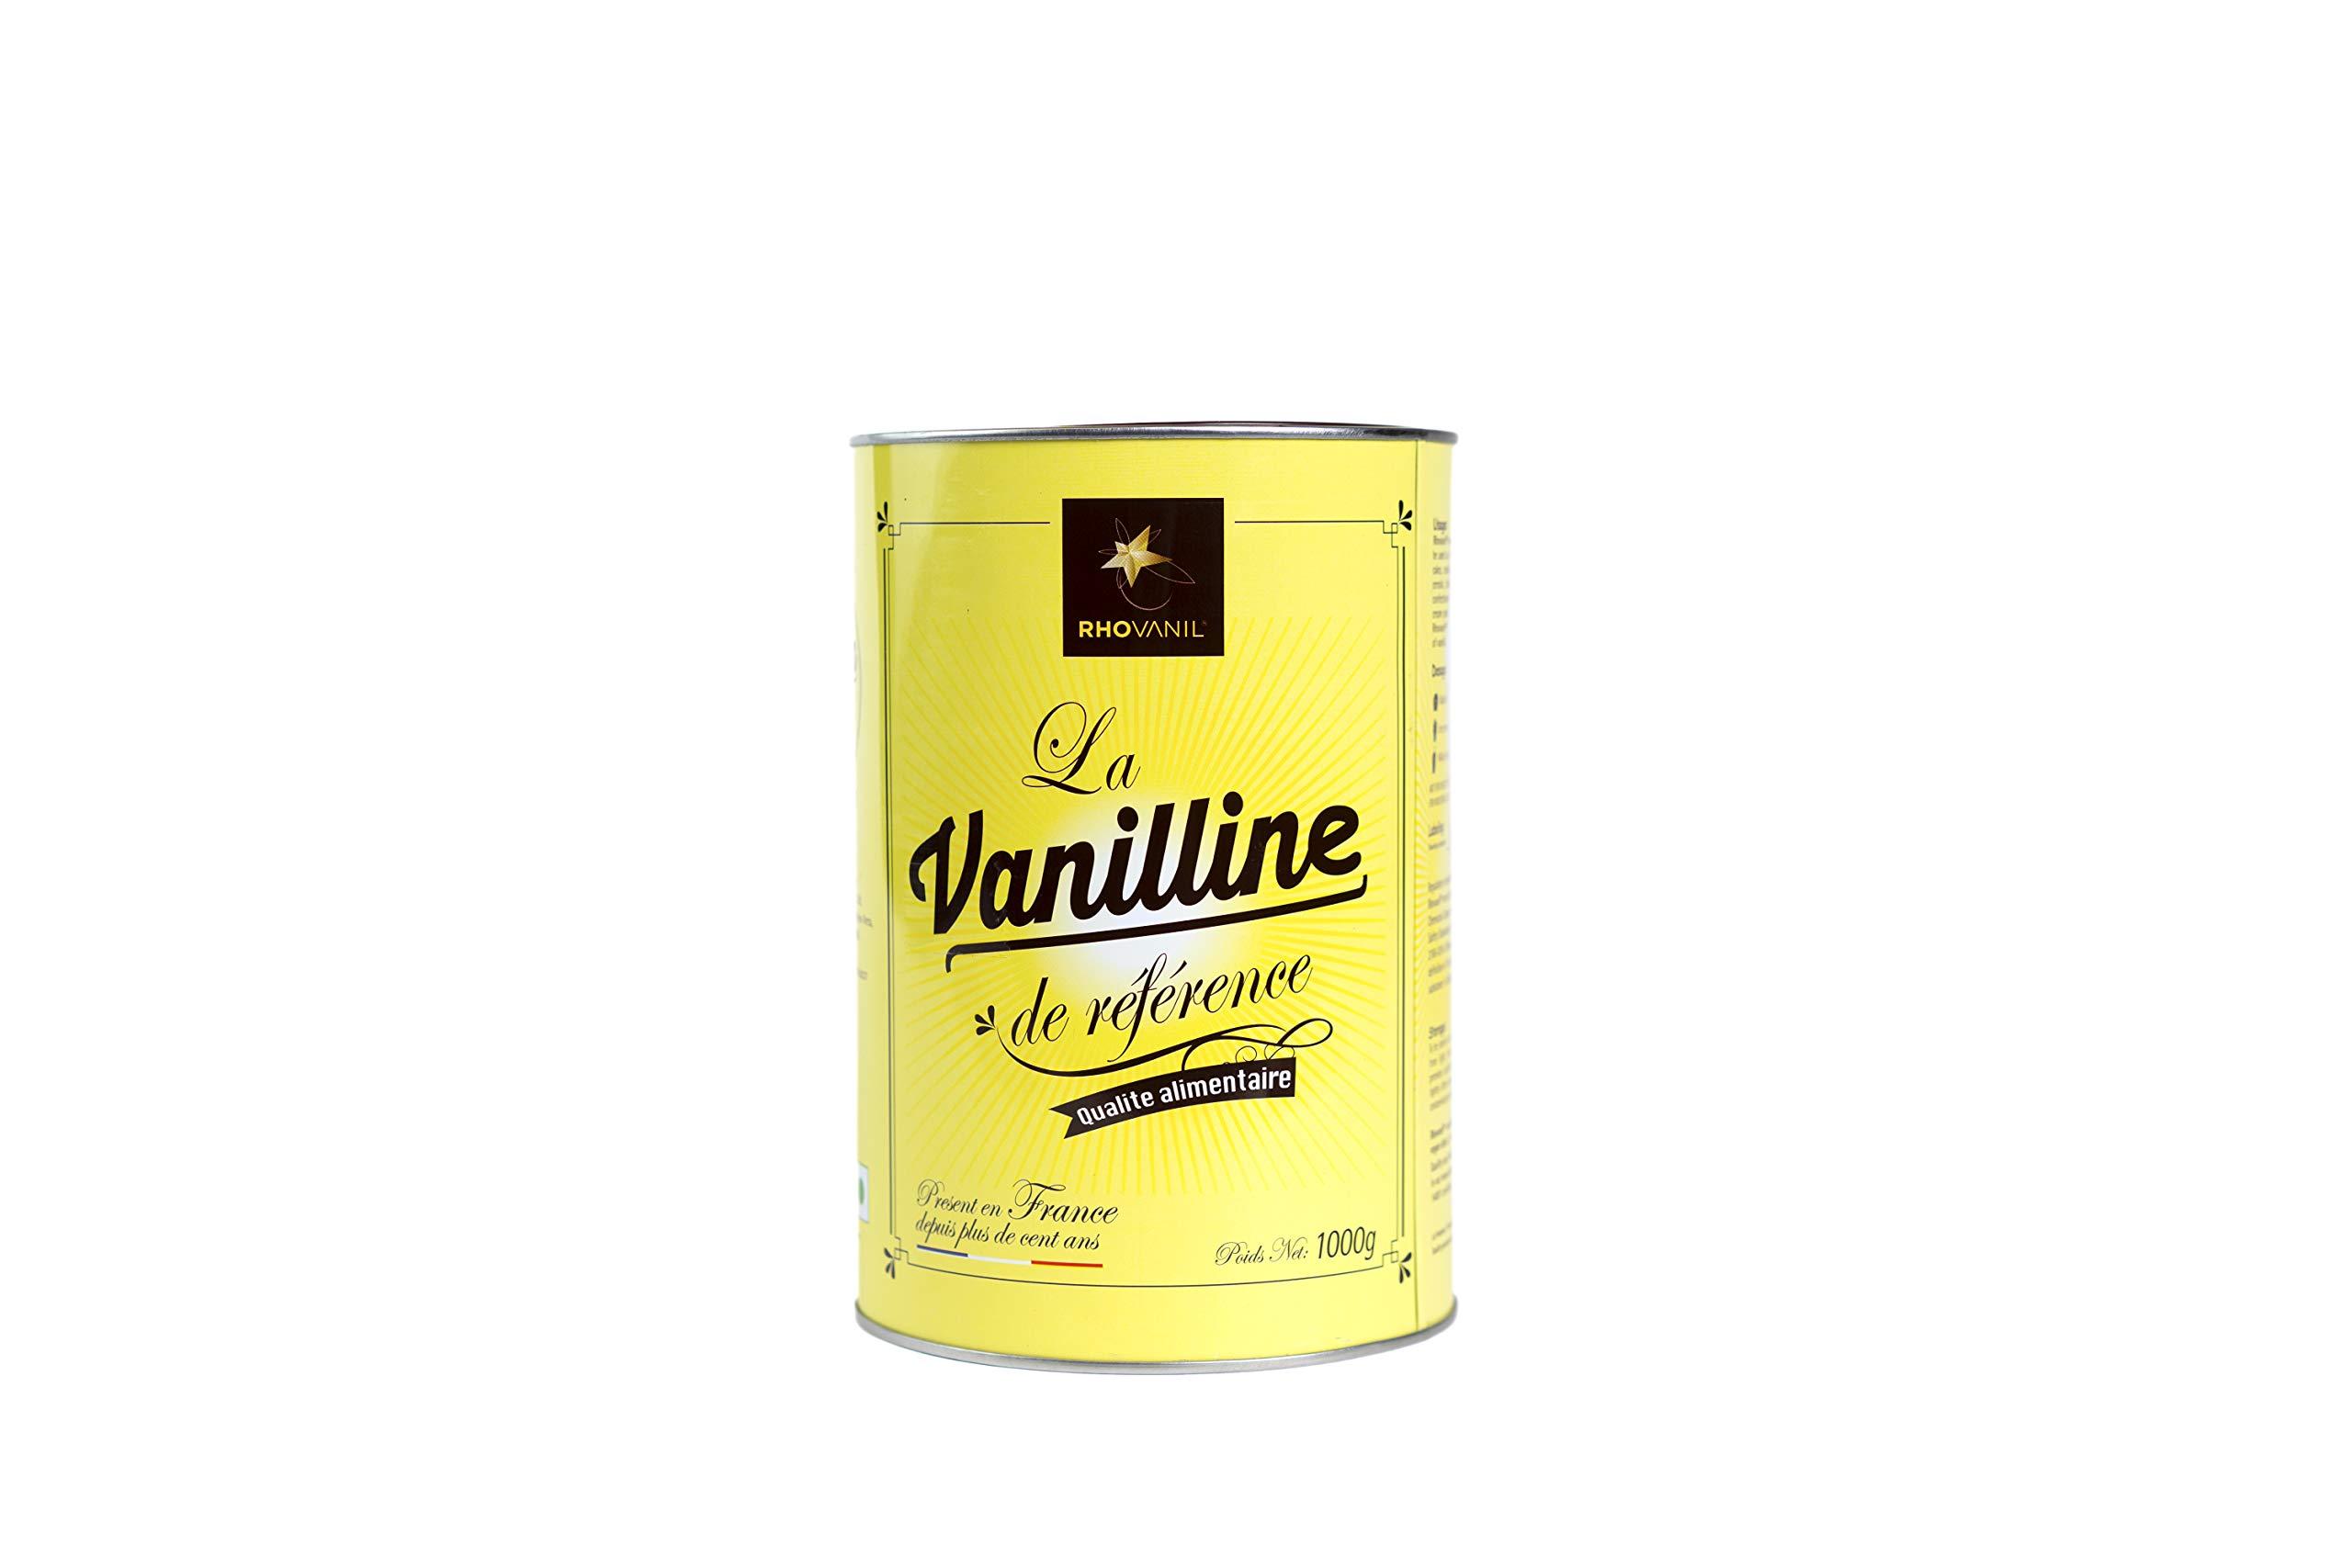 Vanillin Powder Rhovanil 1kg